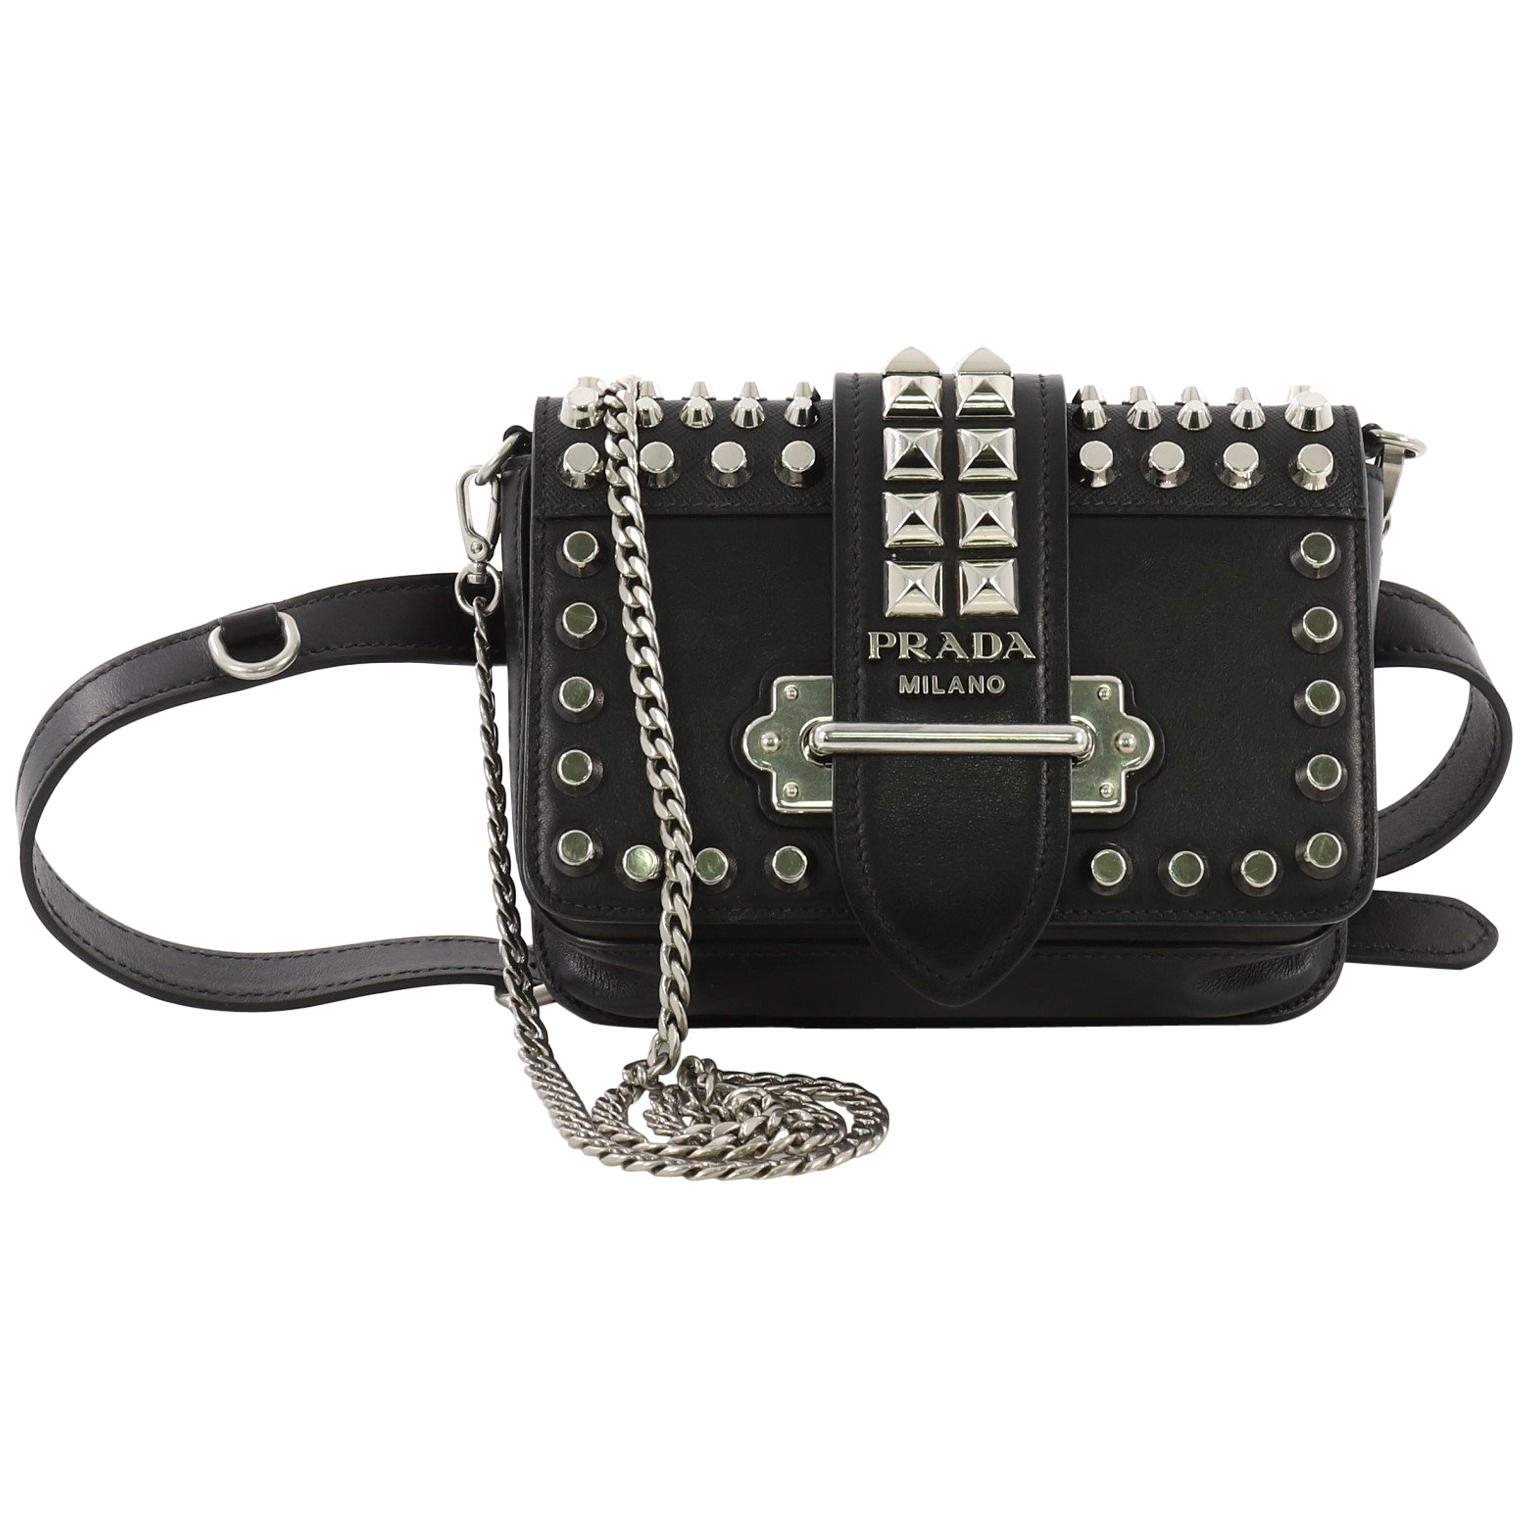 8e734f0d8b3d Vintage Prada Handbags and Purses - 1